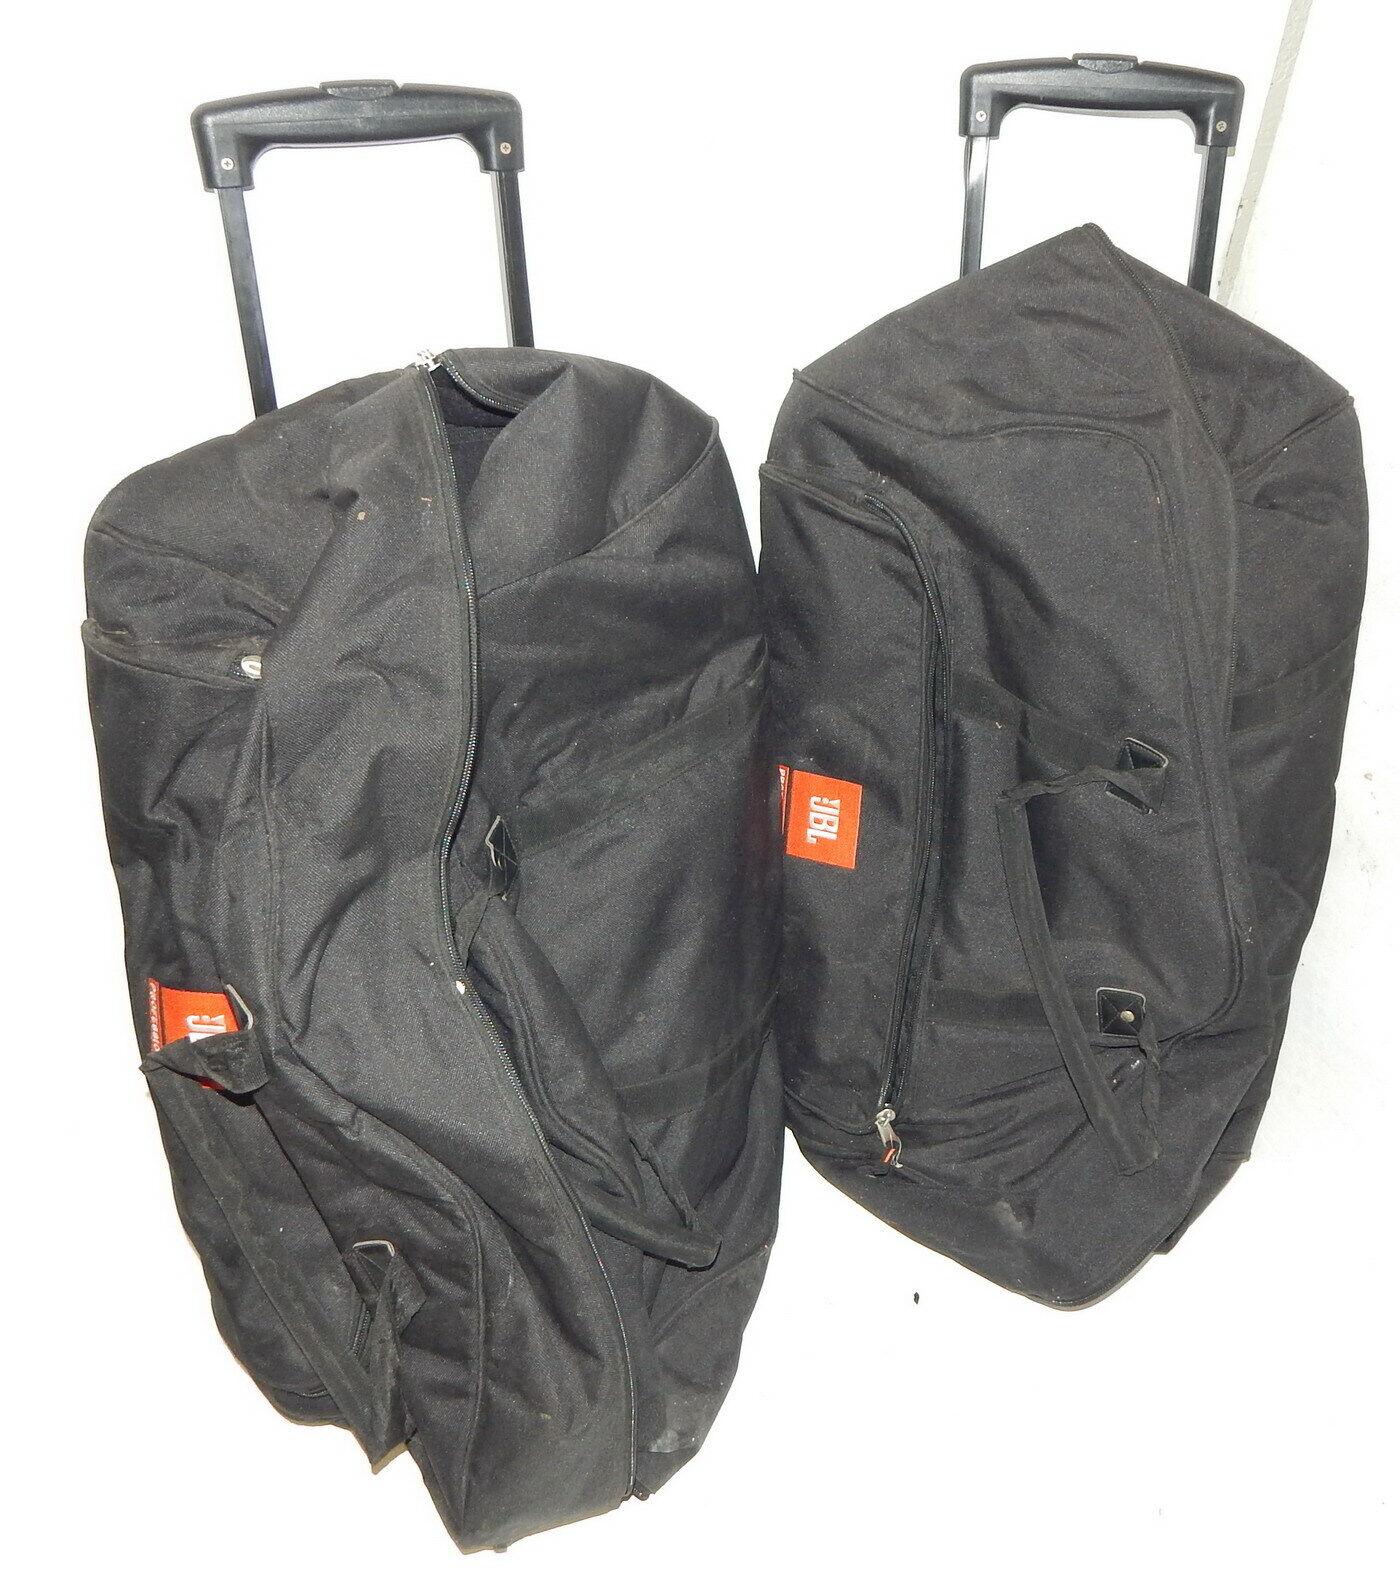 JBL EON15 schwarz padded bags covers set of 2